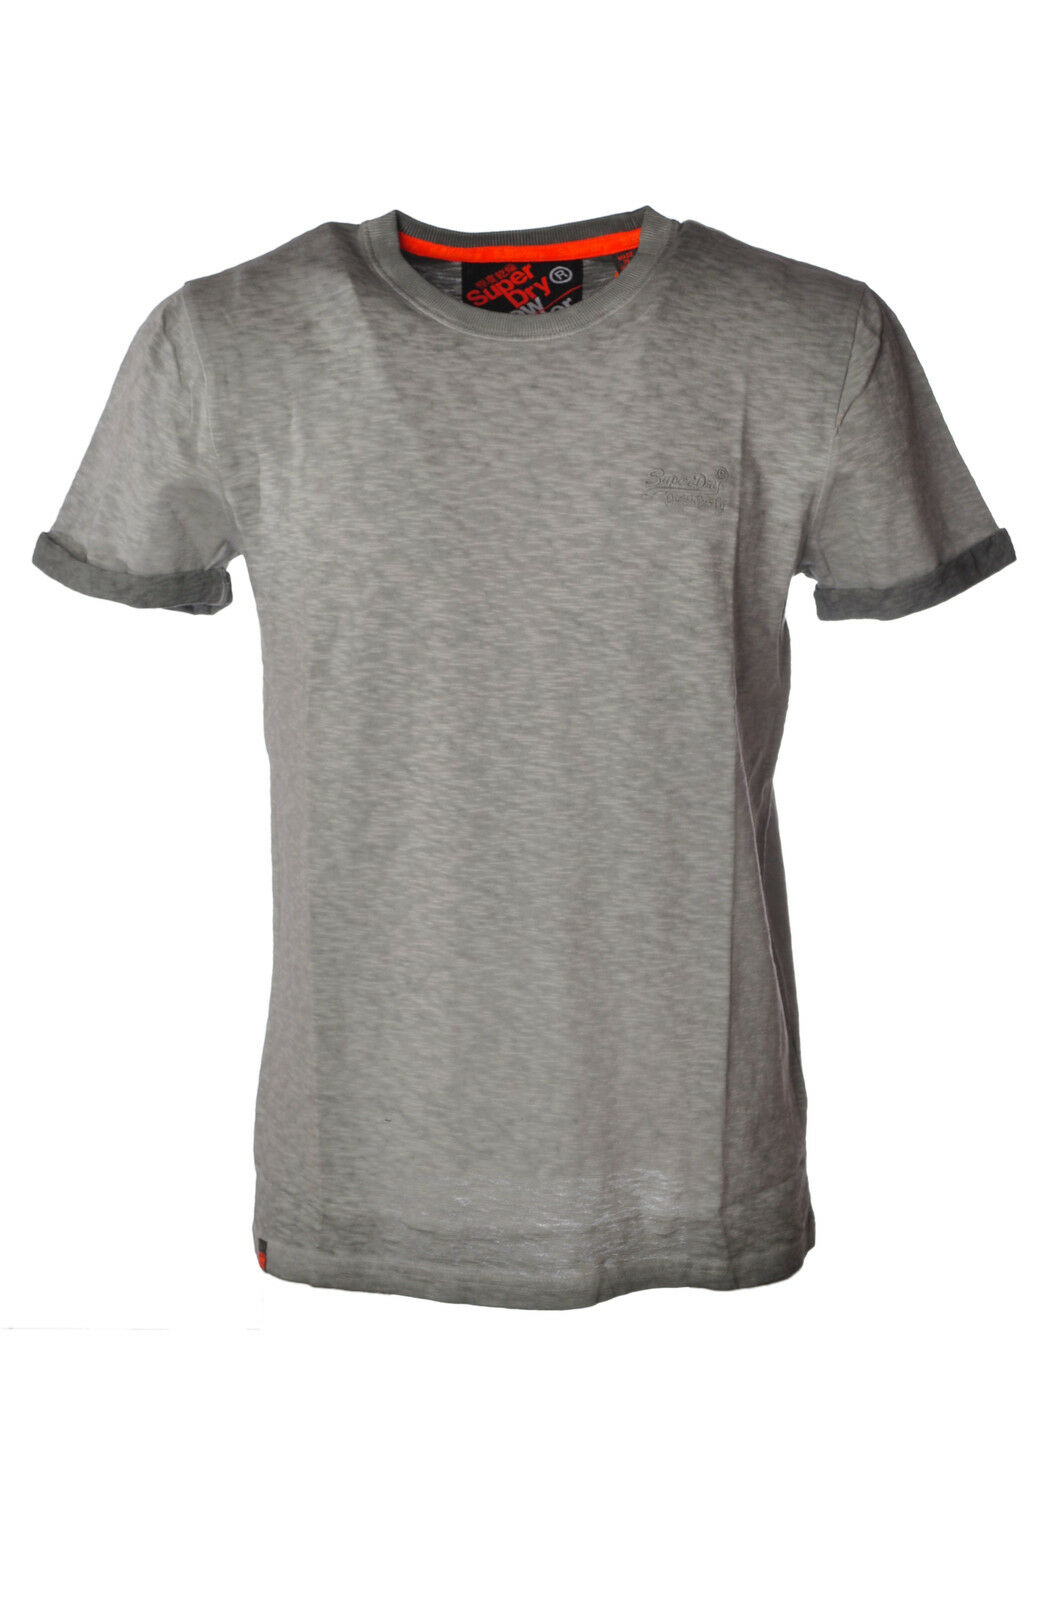 Superdry - Topwear-T-shirts - Man - Grau - 3478814H184211